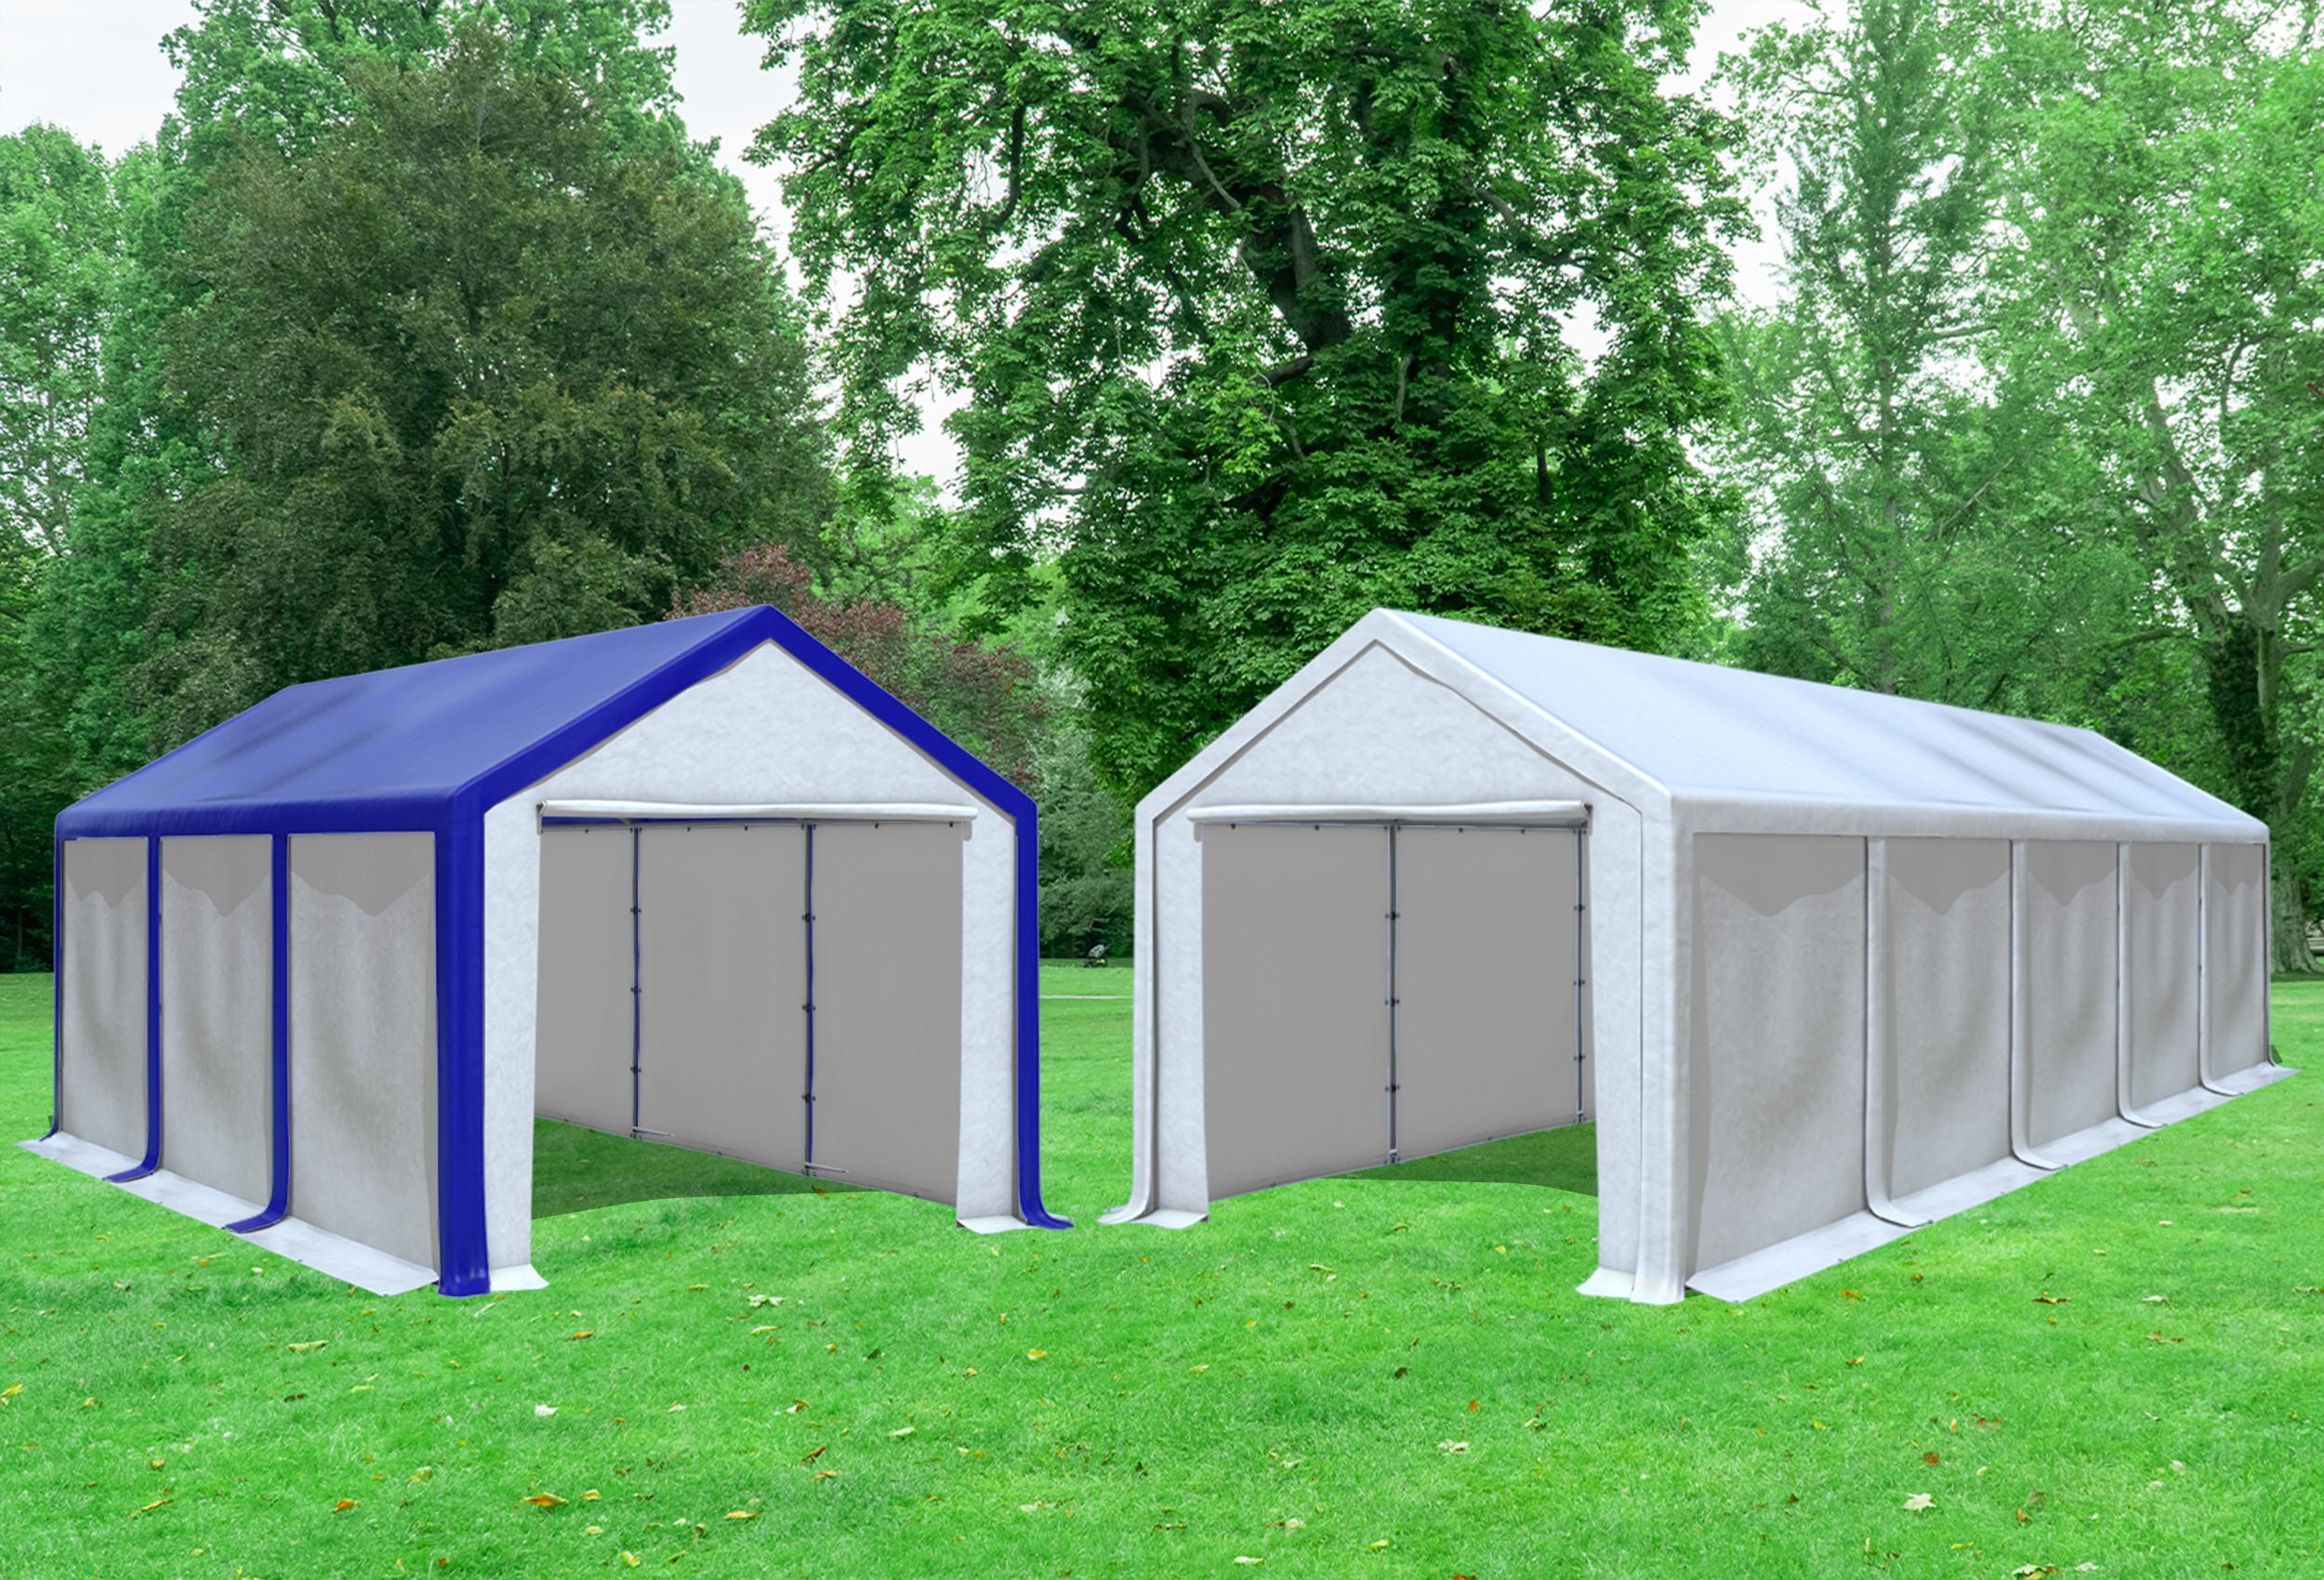 kombizelt 2in1 3x6 zu 3x10m partyzelt pvc modular pro pvc wei blau profi zelt. Black Bedroom Furniture Sets. Home Design Ideas